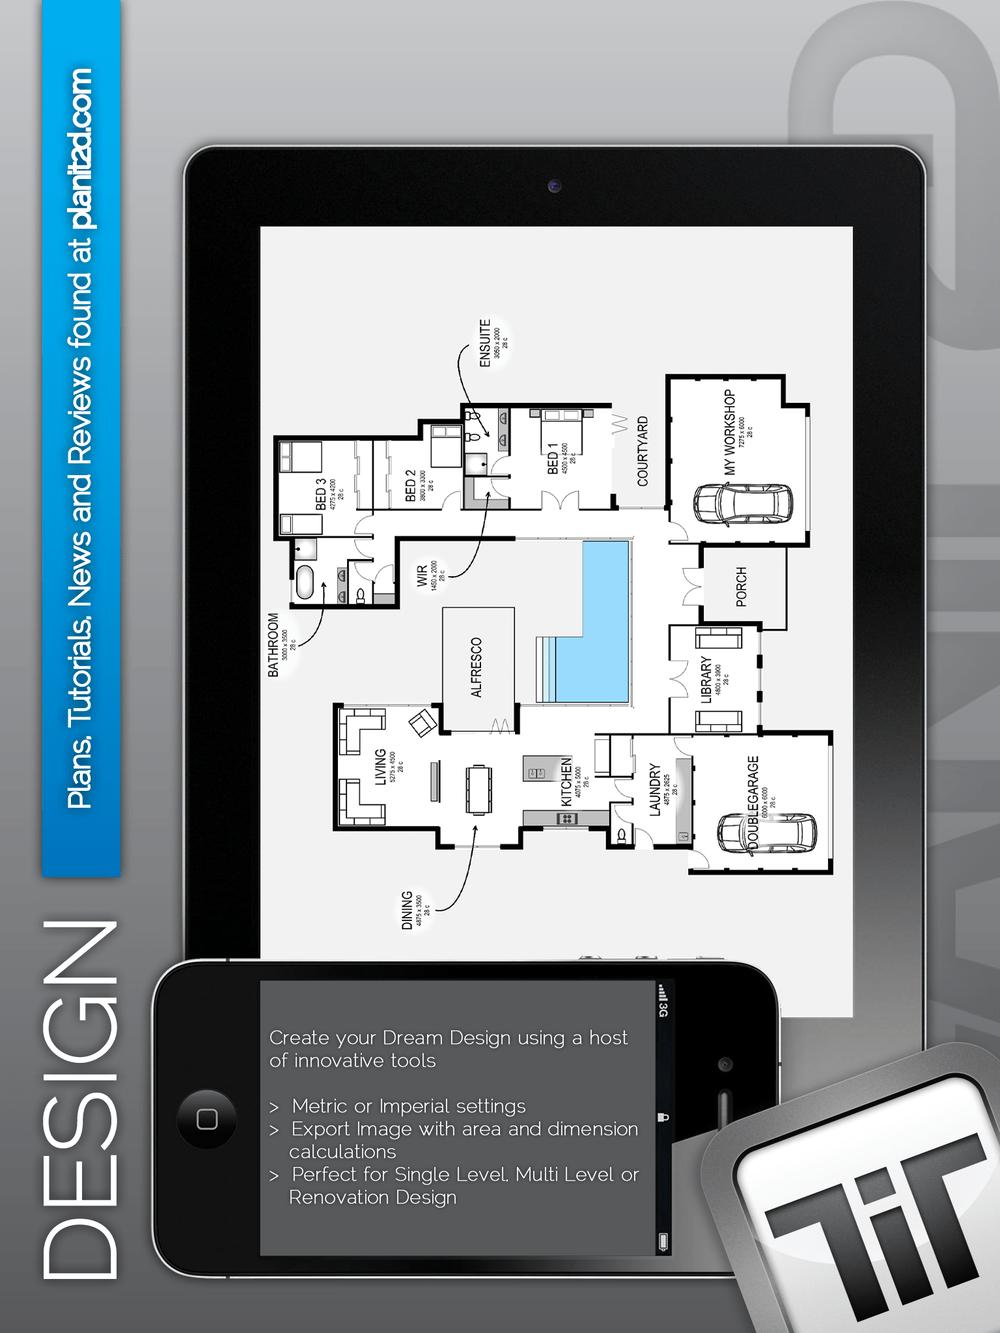 Great new home design app!